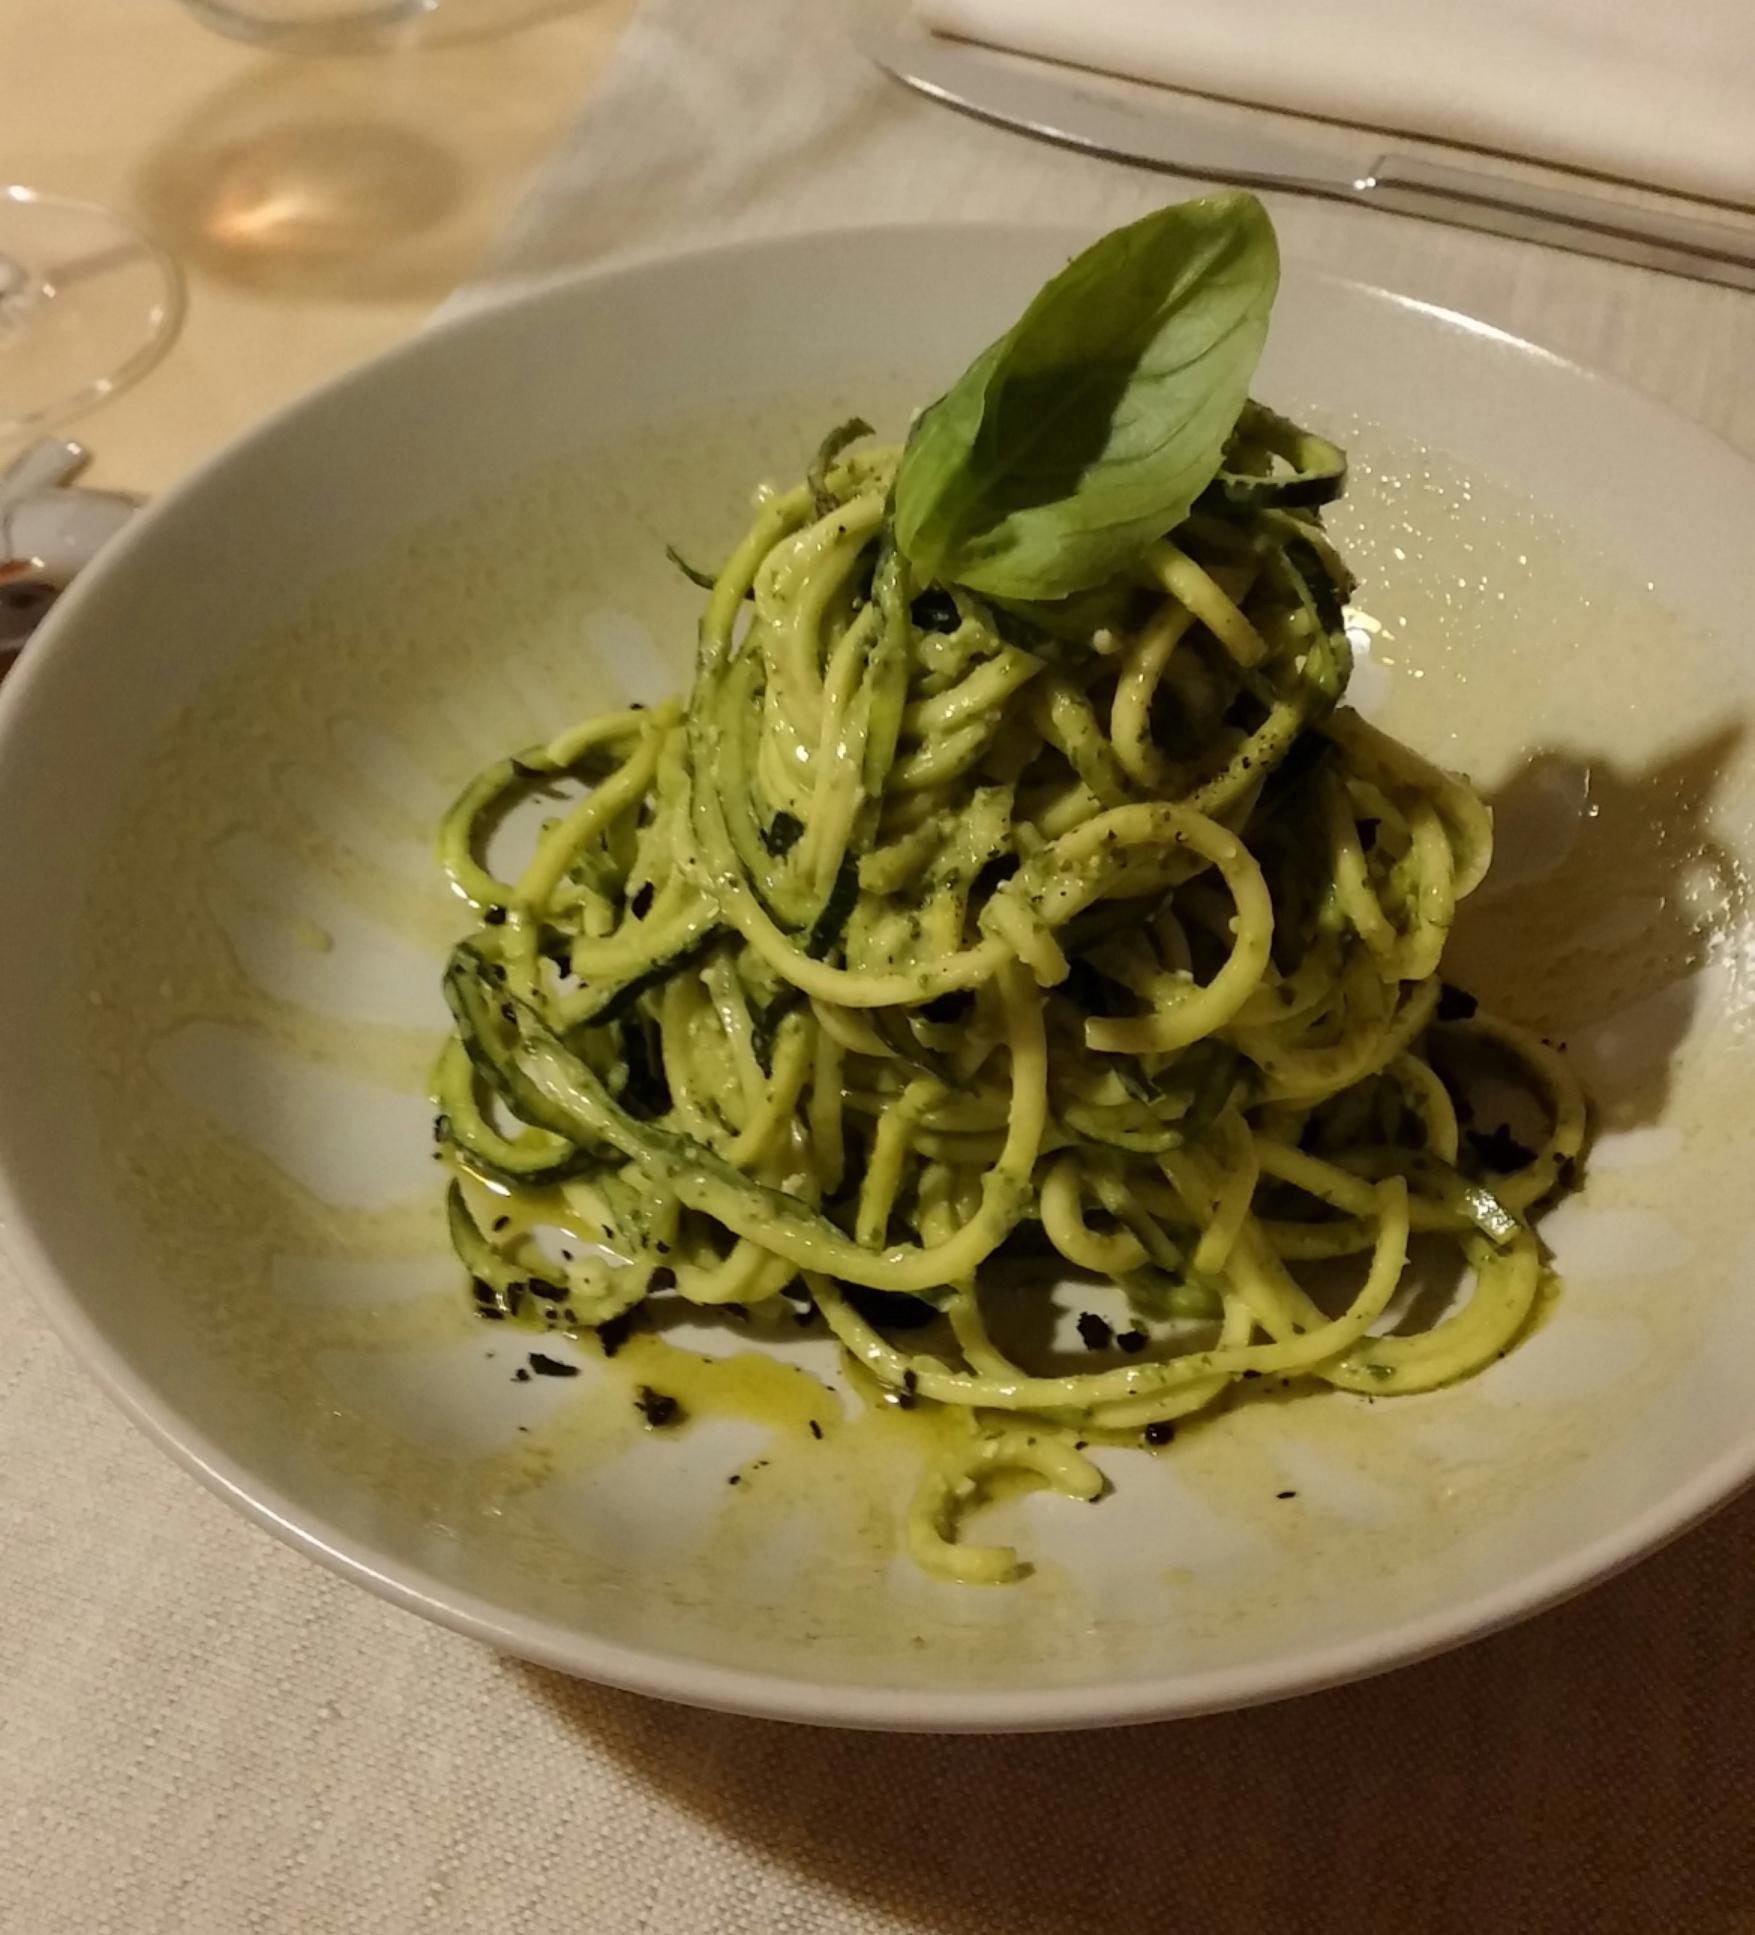 Vegan Zucchini Spaghetti With Basil Pesto